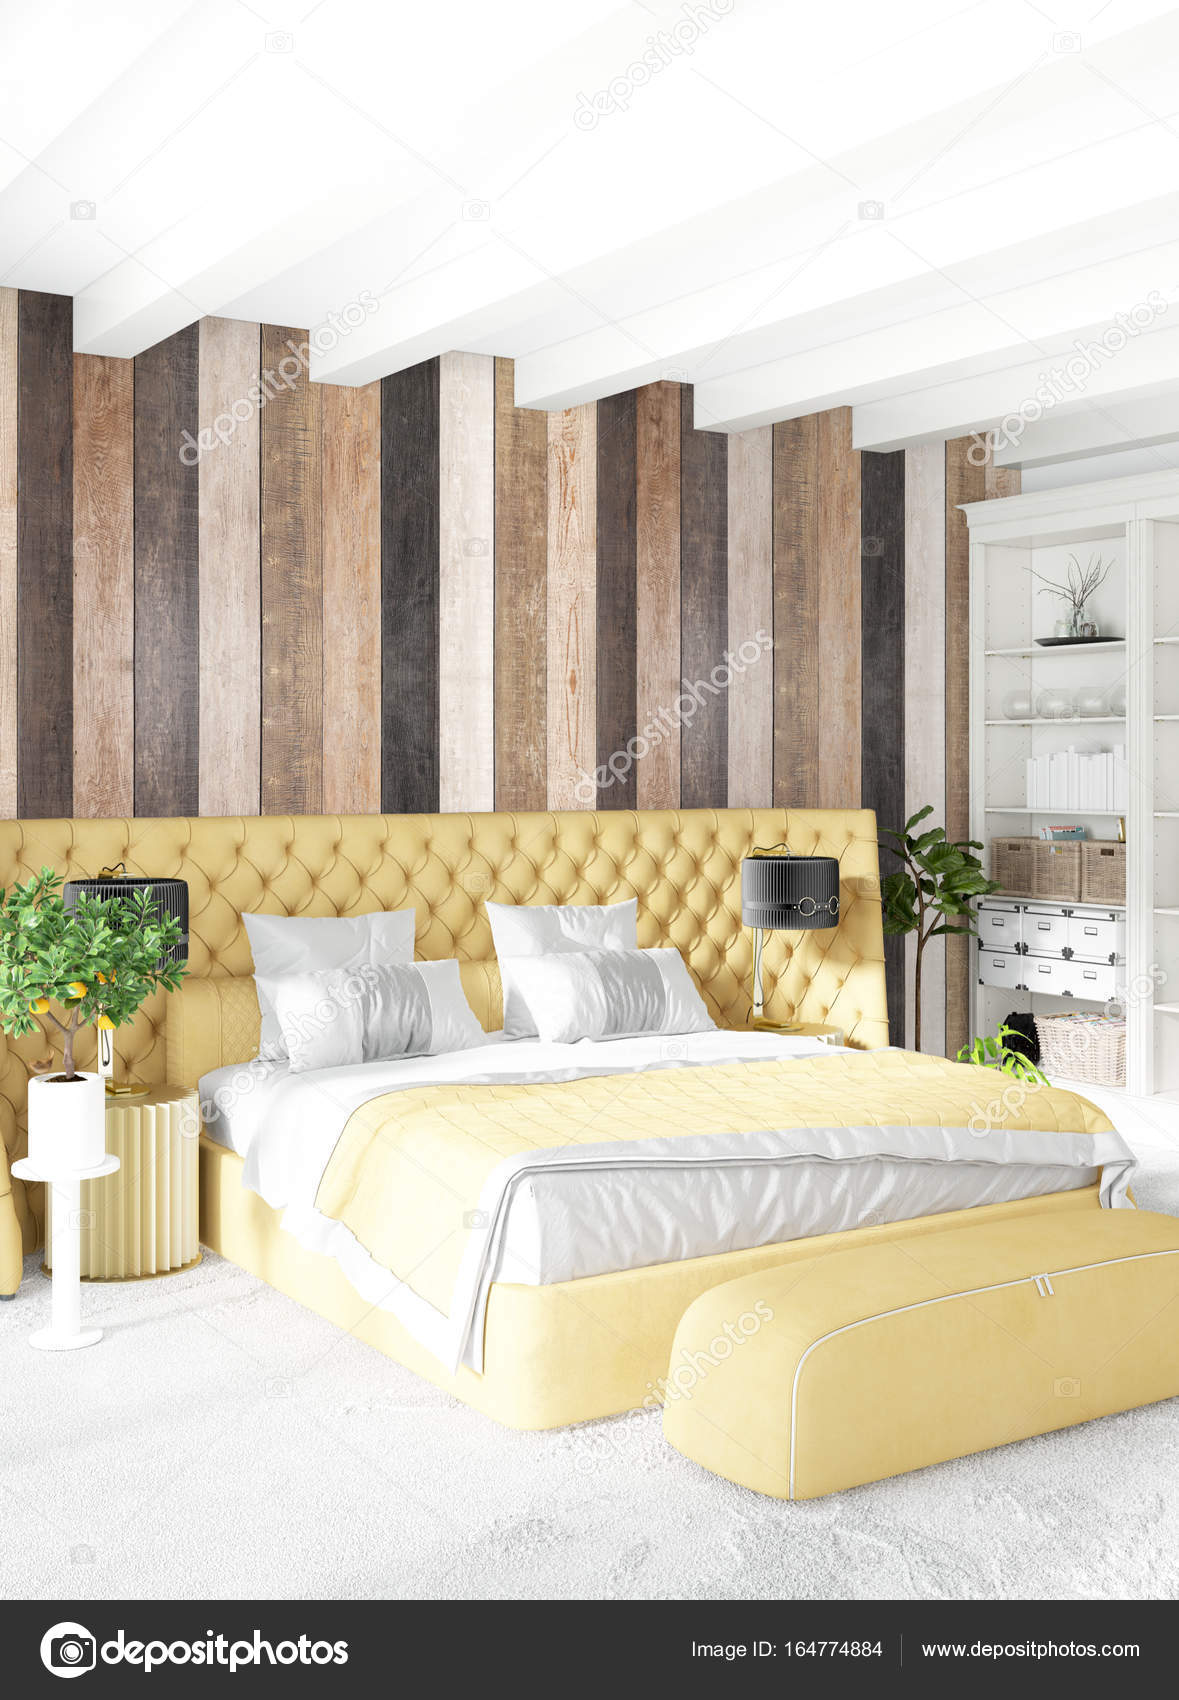 decor modern bed designs room for bedrooms minimal bedroom design minimalist ideas decorate